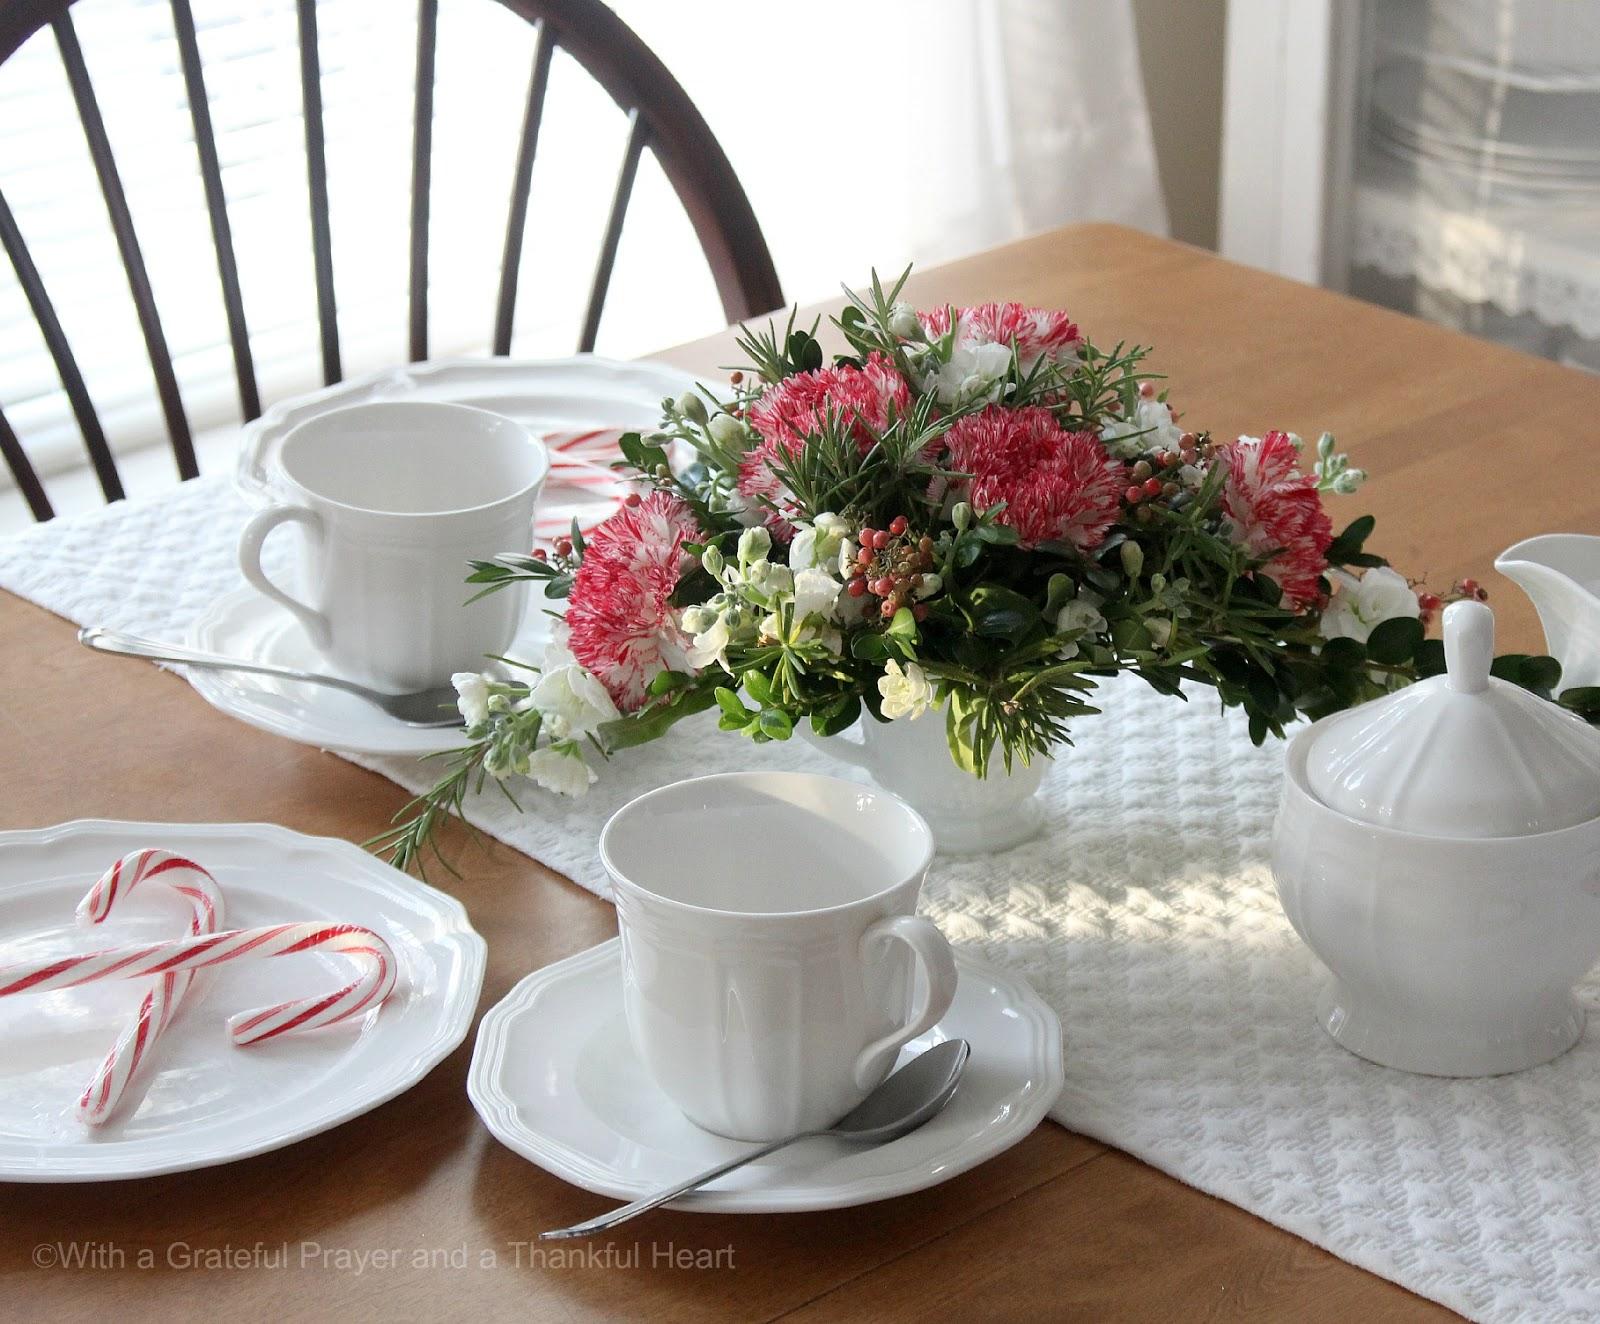 how to make a floral christmas centerpiece - grateful prayer